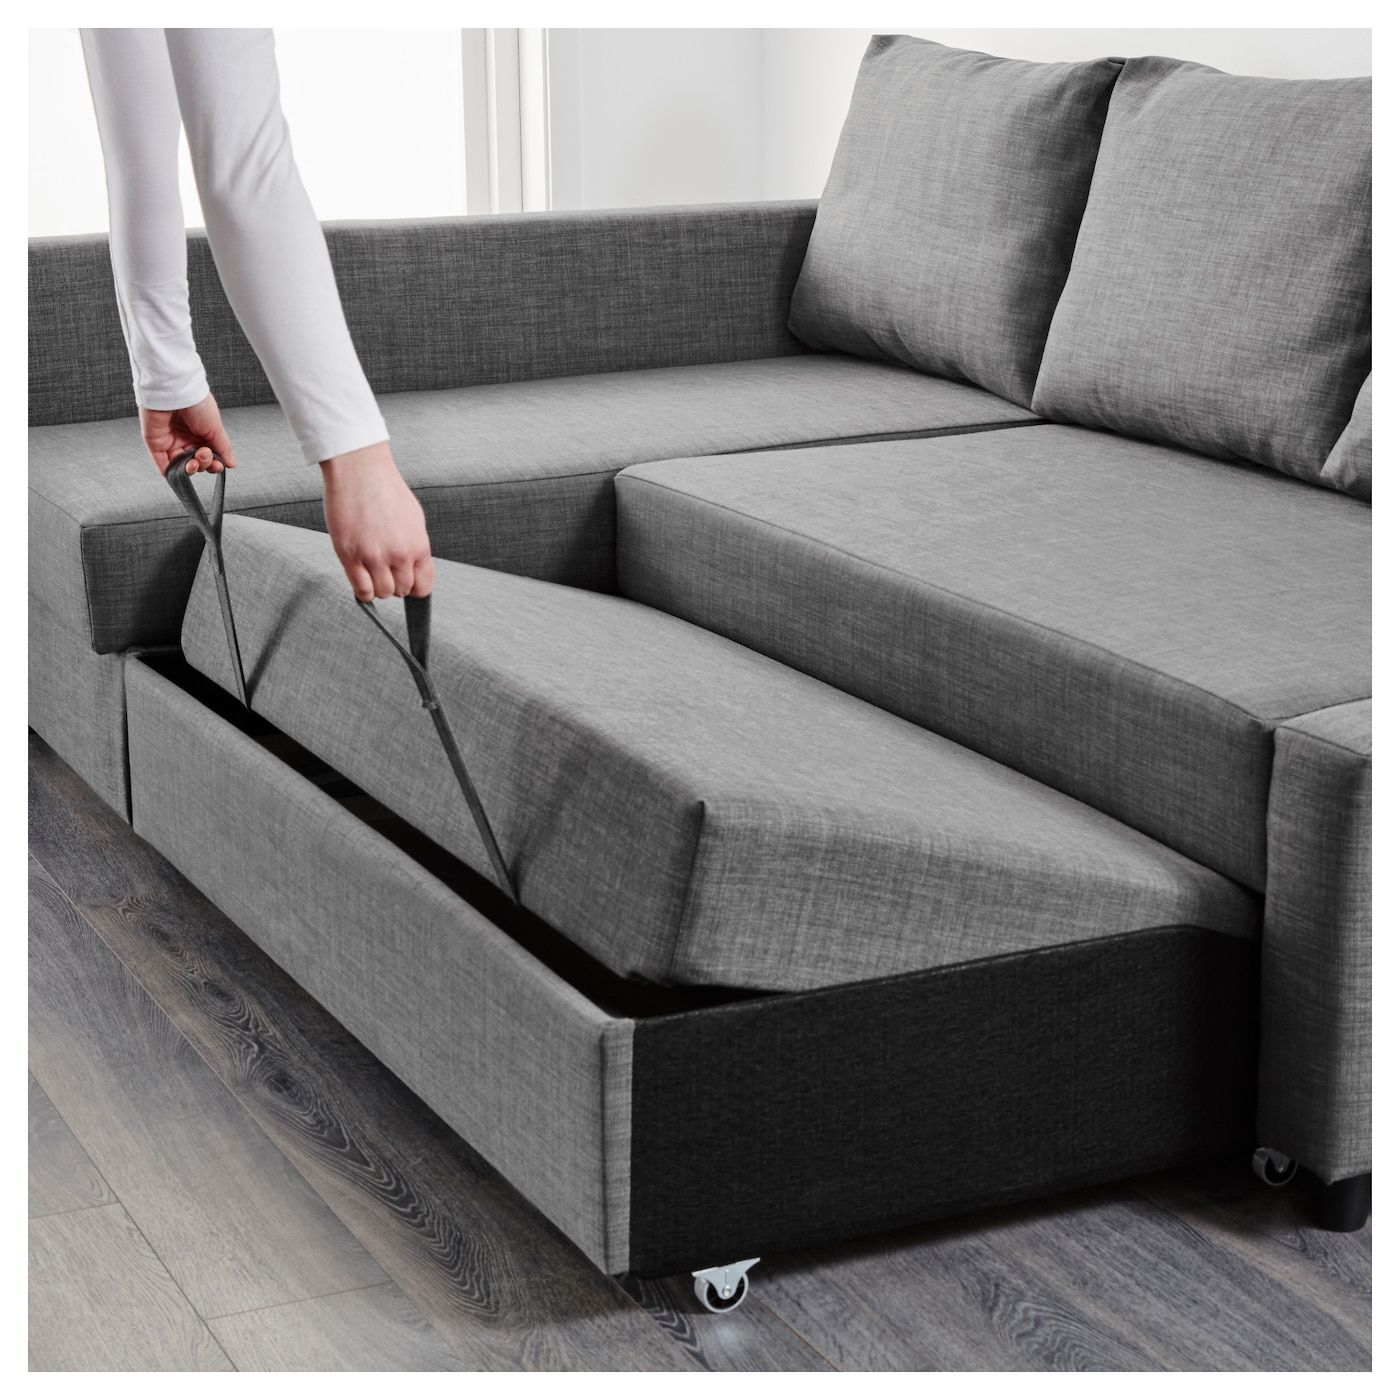 Friheten Sleeper Sectional 3 Seat W Storage Skiftebo Dark Gray Ikea In 2020 Sofa Bed With Storage Corner Sofa Bed Corner Sofa Bed With Storage